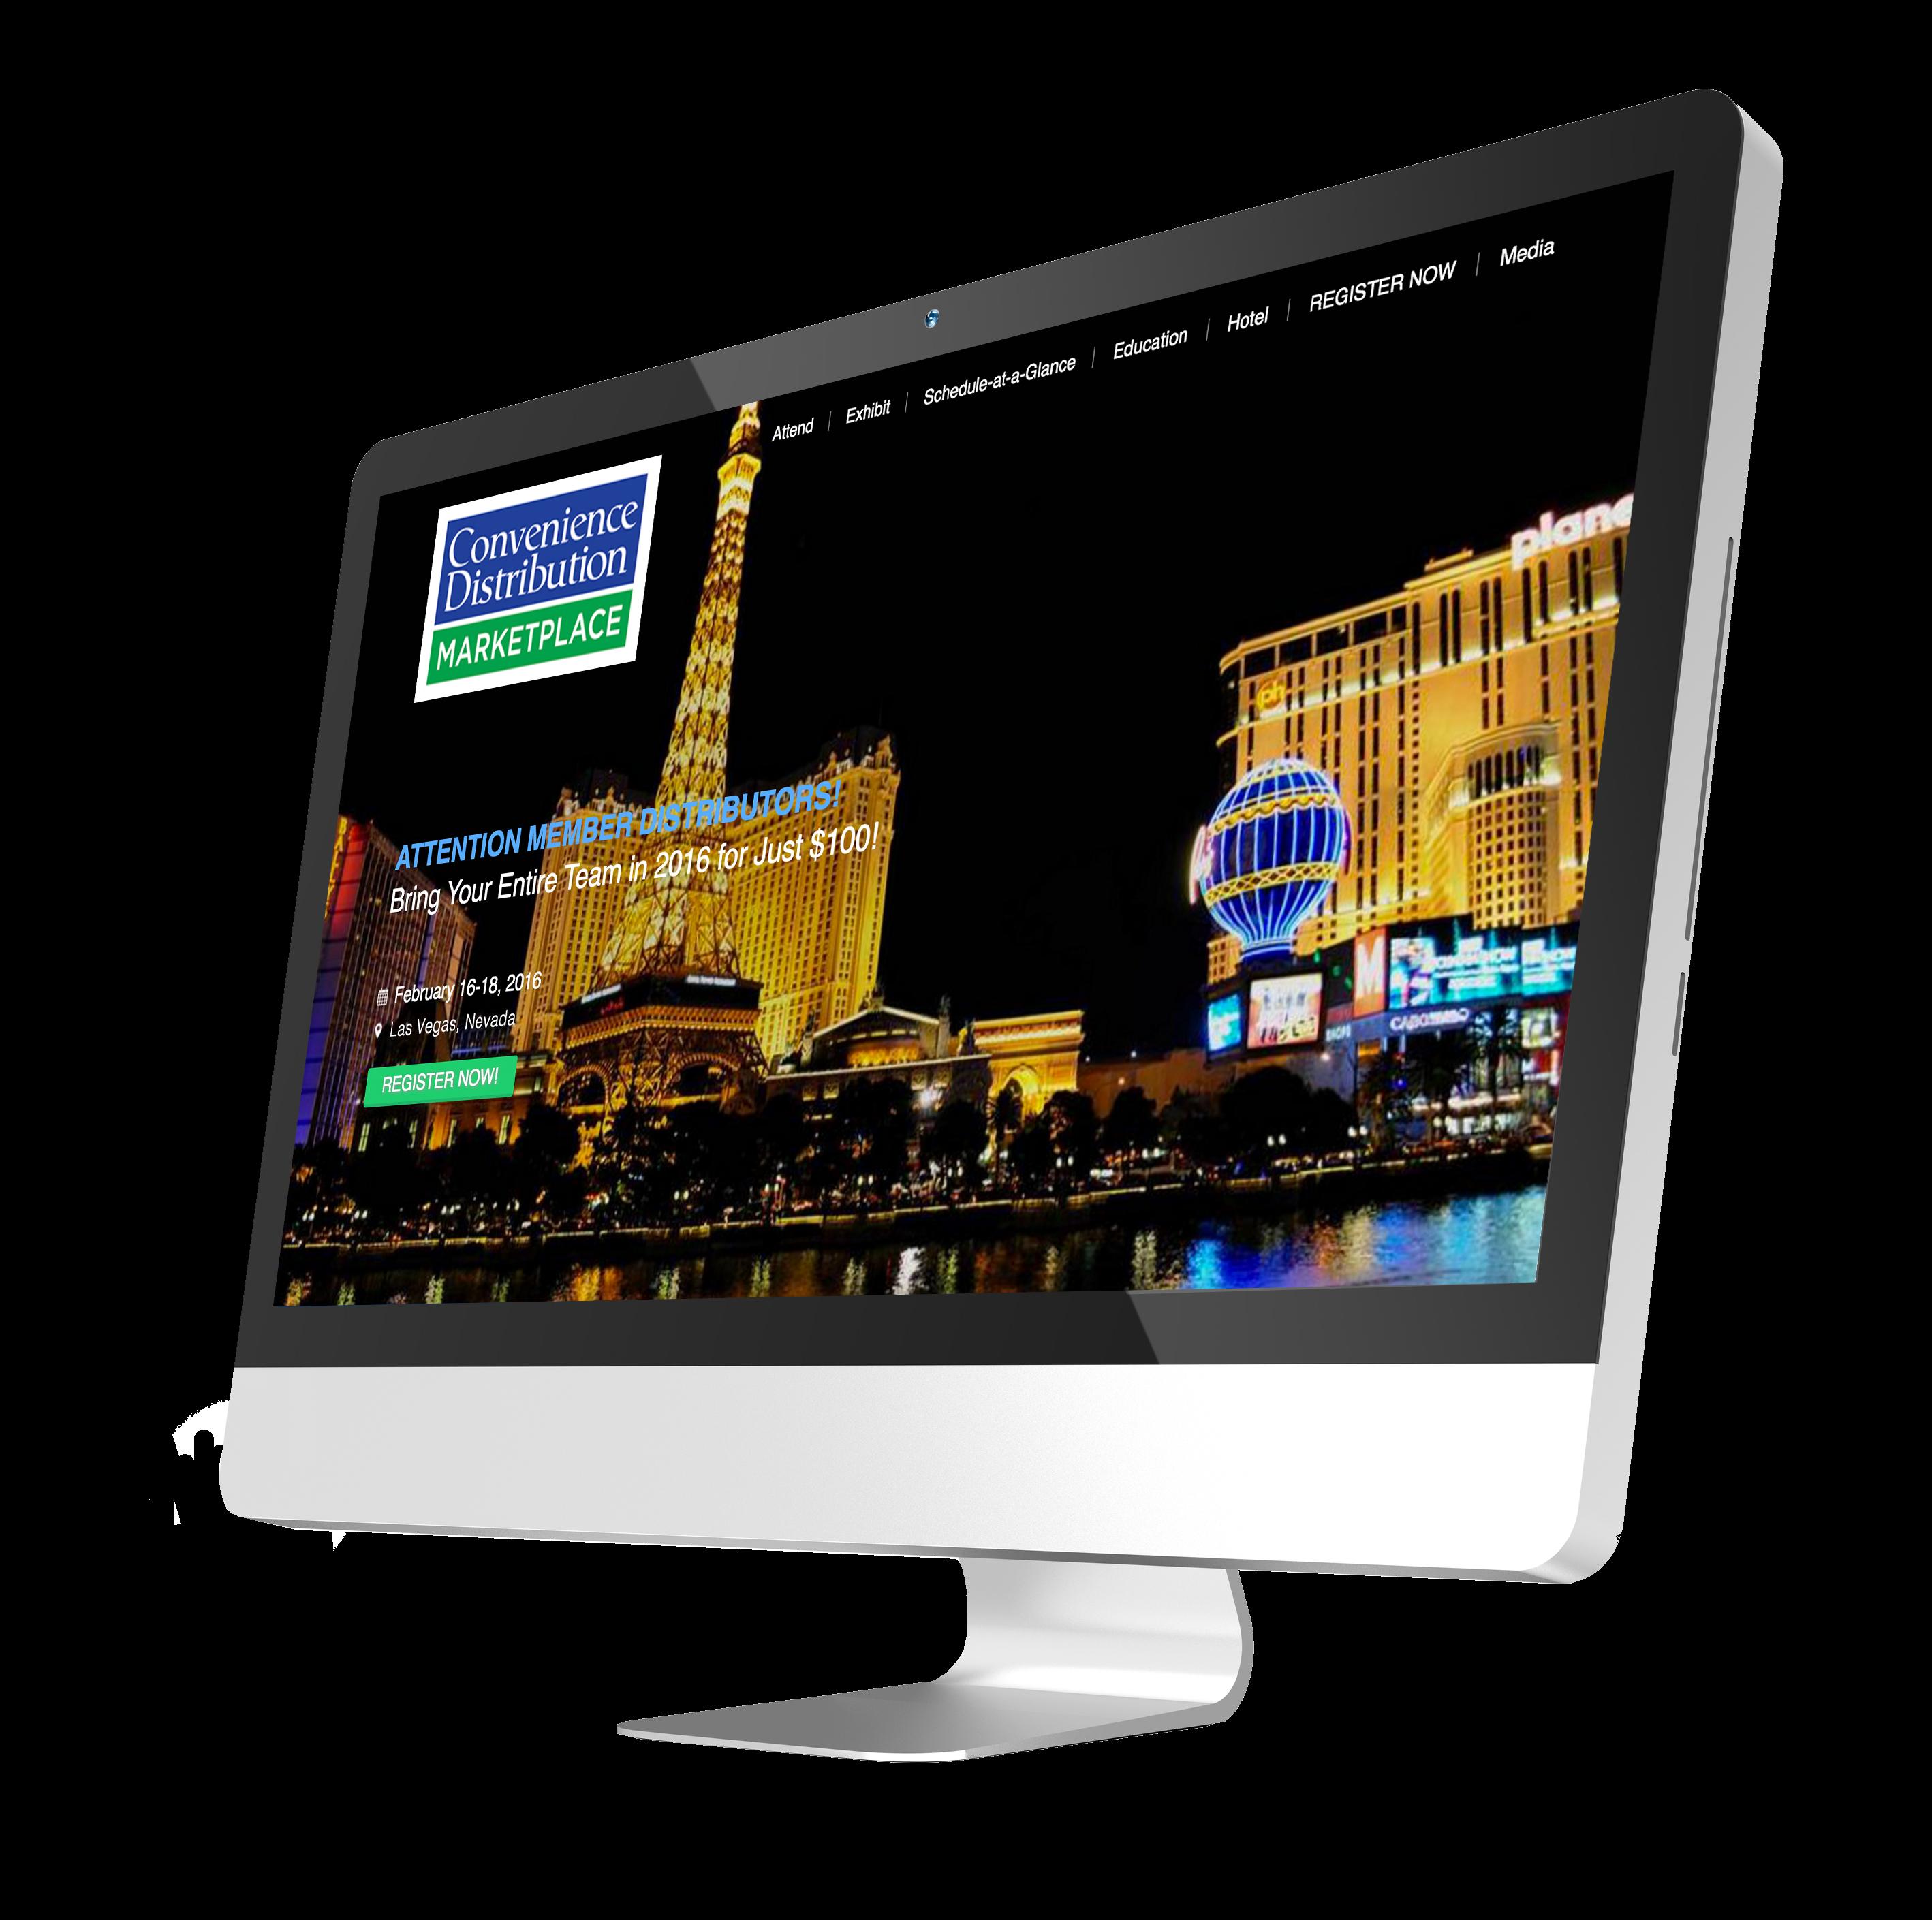 Desktopview